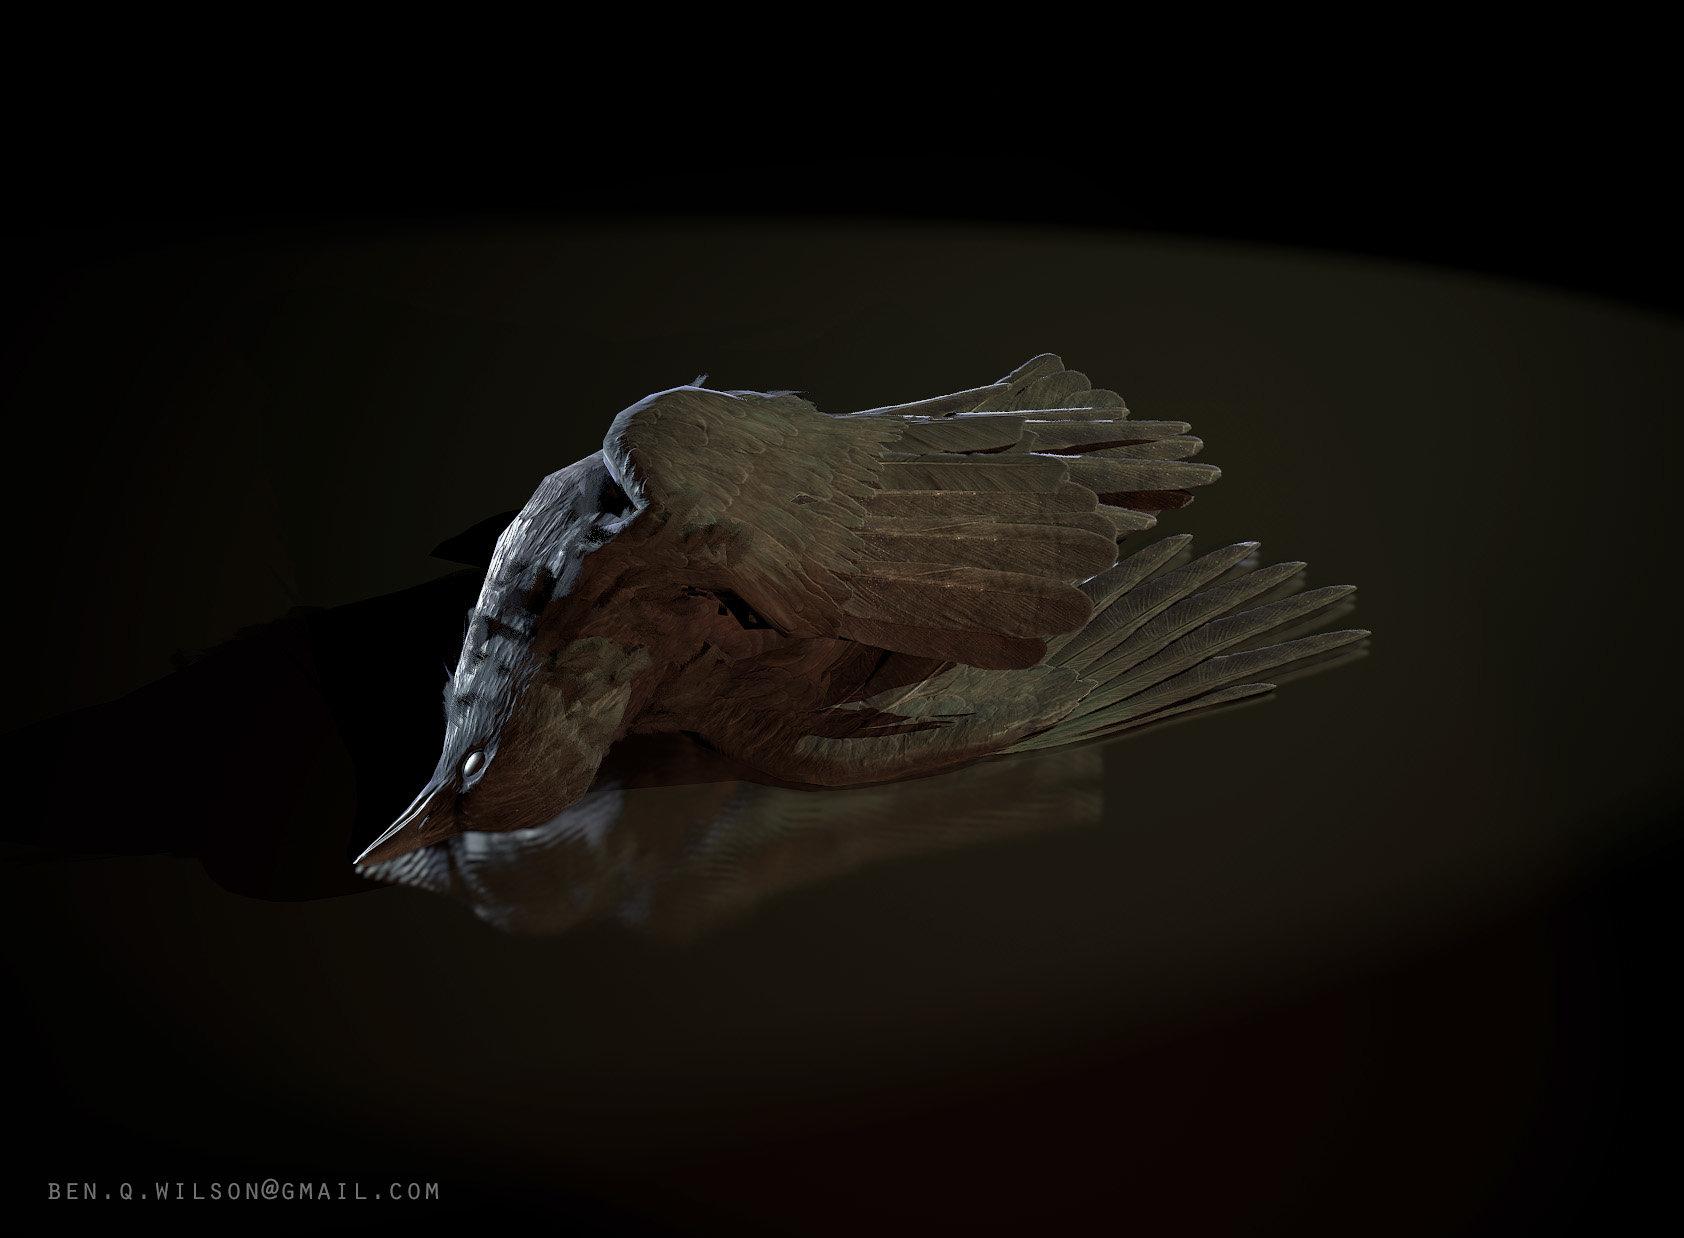 Ben wilson crow a